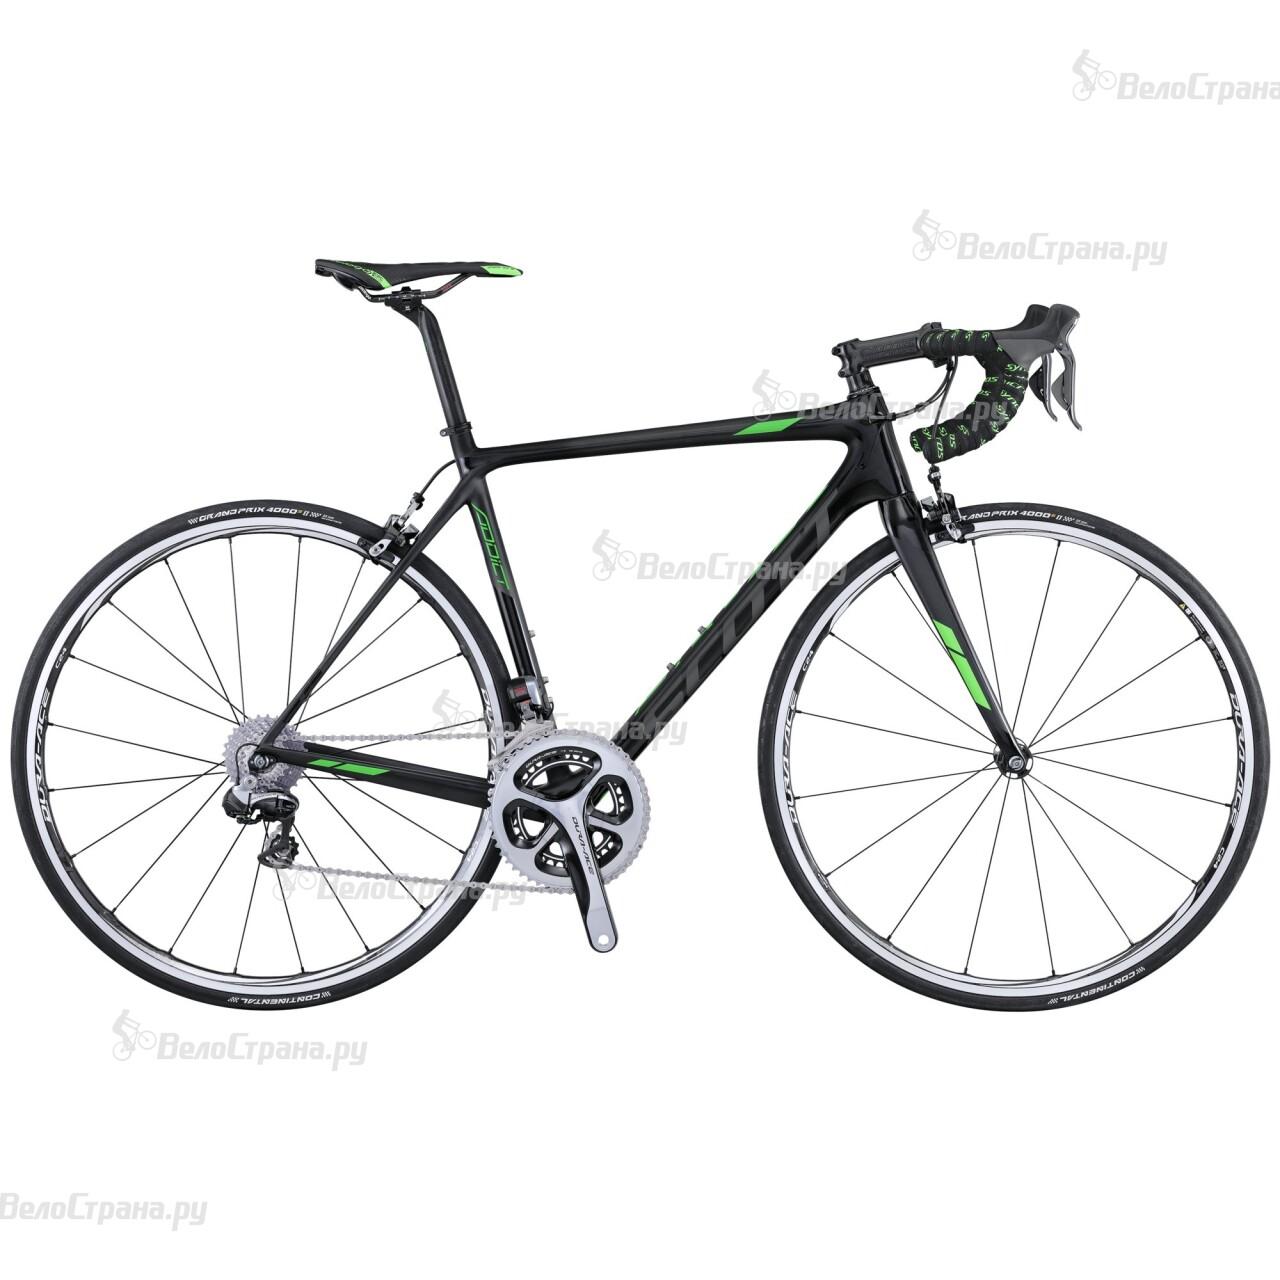 Велосипед Scott Addict Team Issue (2016) scott addict sl compact 2015